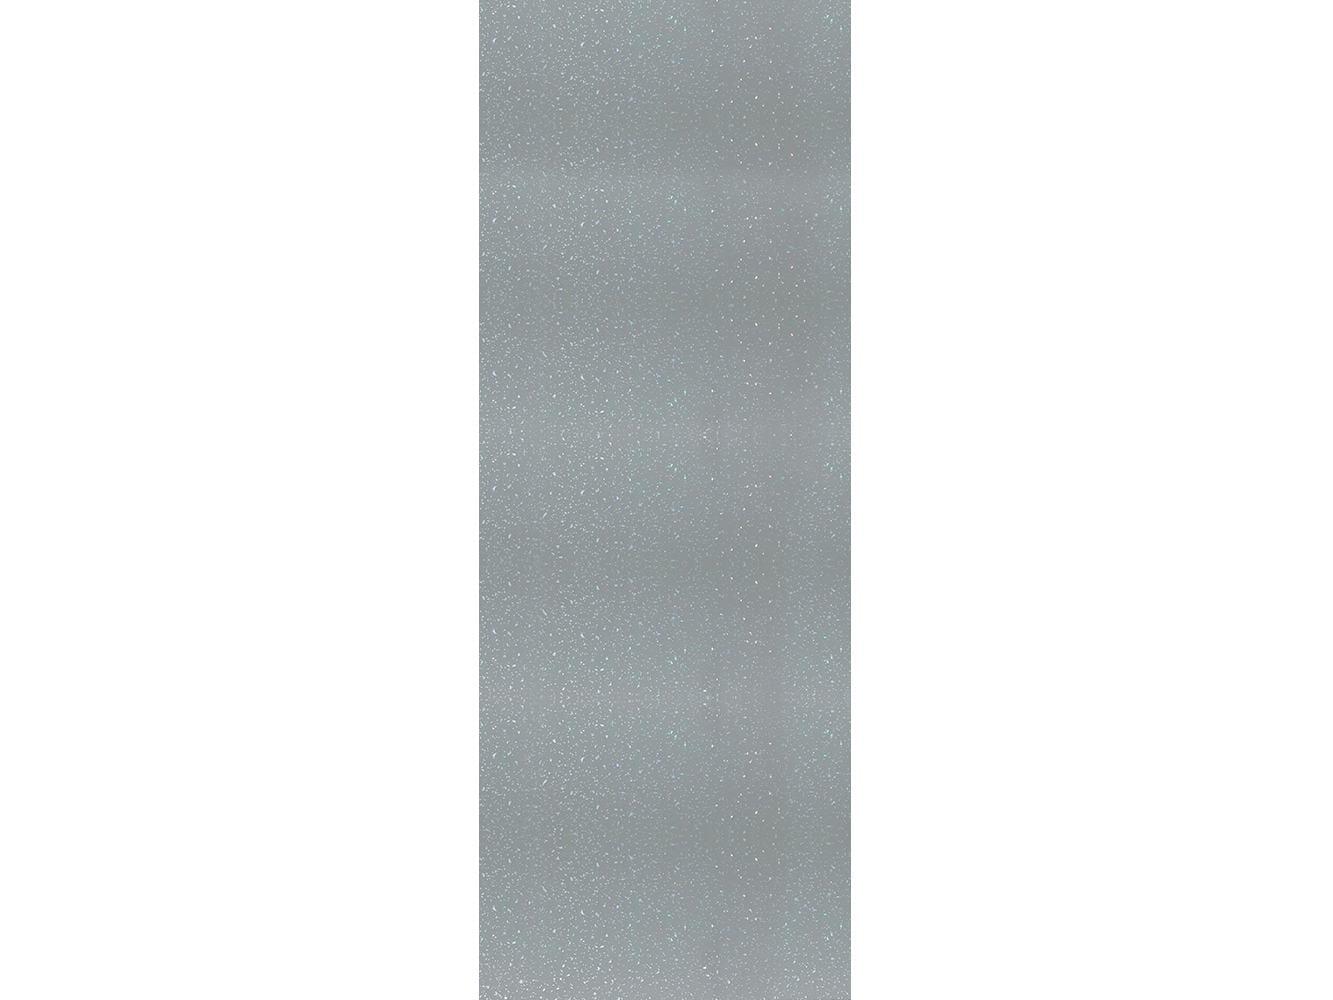 neptune grey sparkle pvc shower wall panel 10mm x 1m x 2